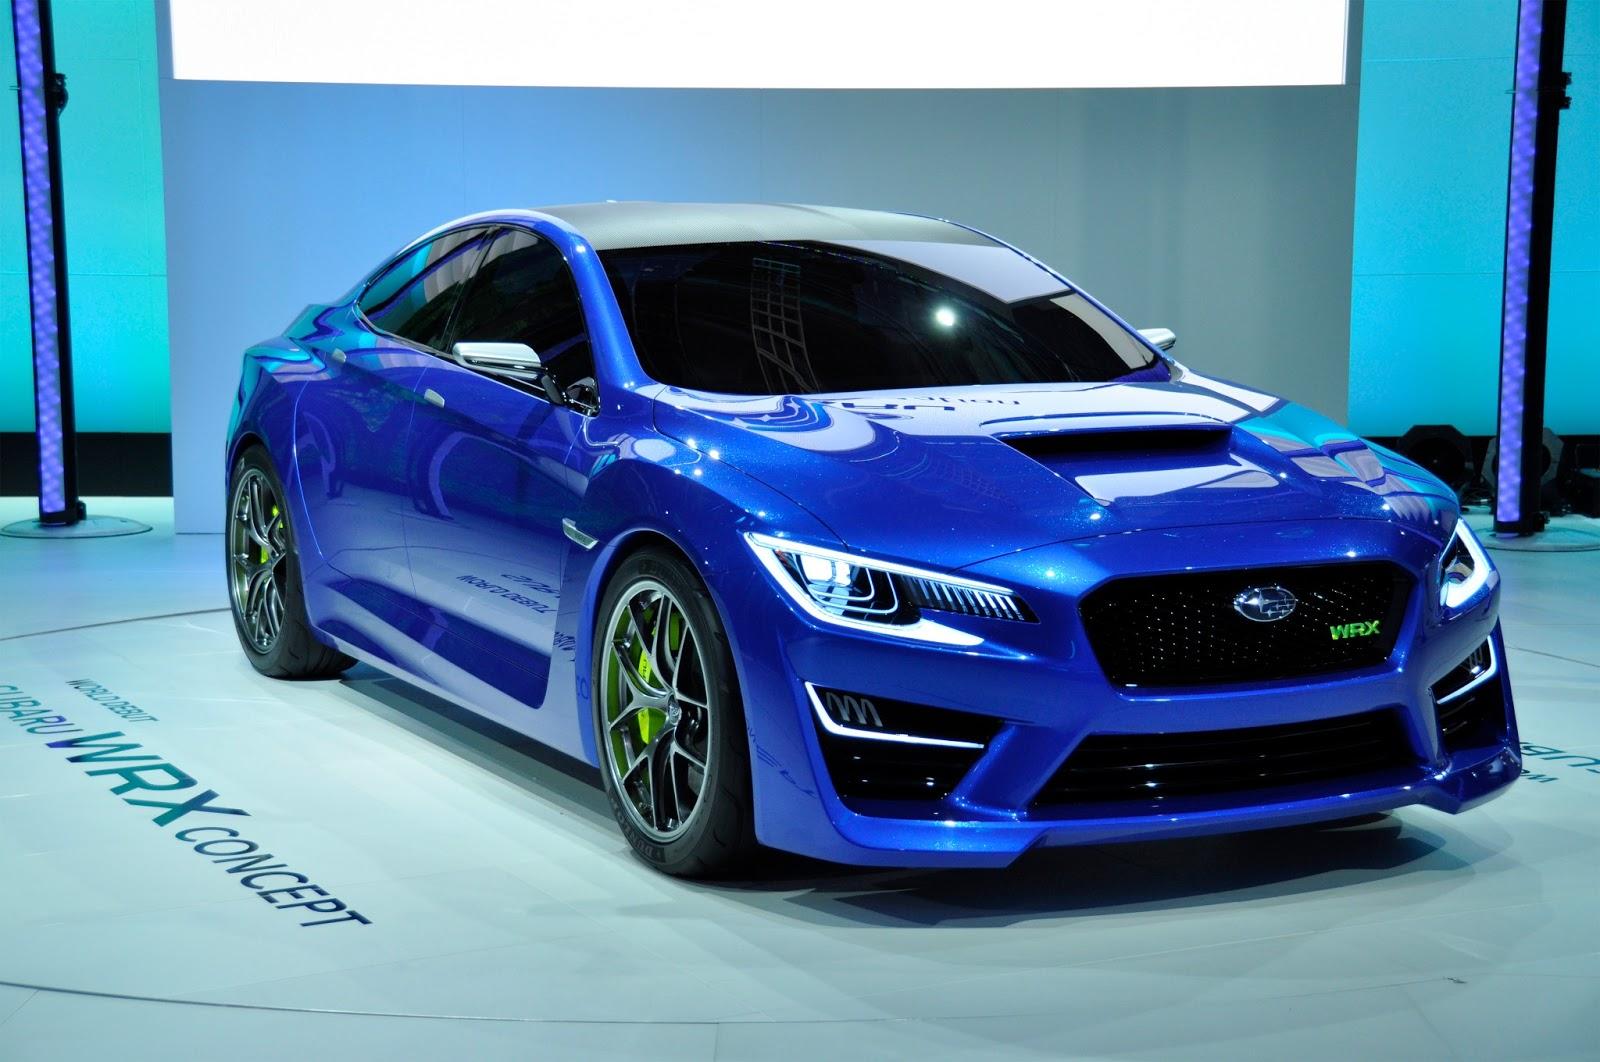 2015 Subaru WRX  WRX STI Concept Release Date  New Car Release